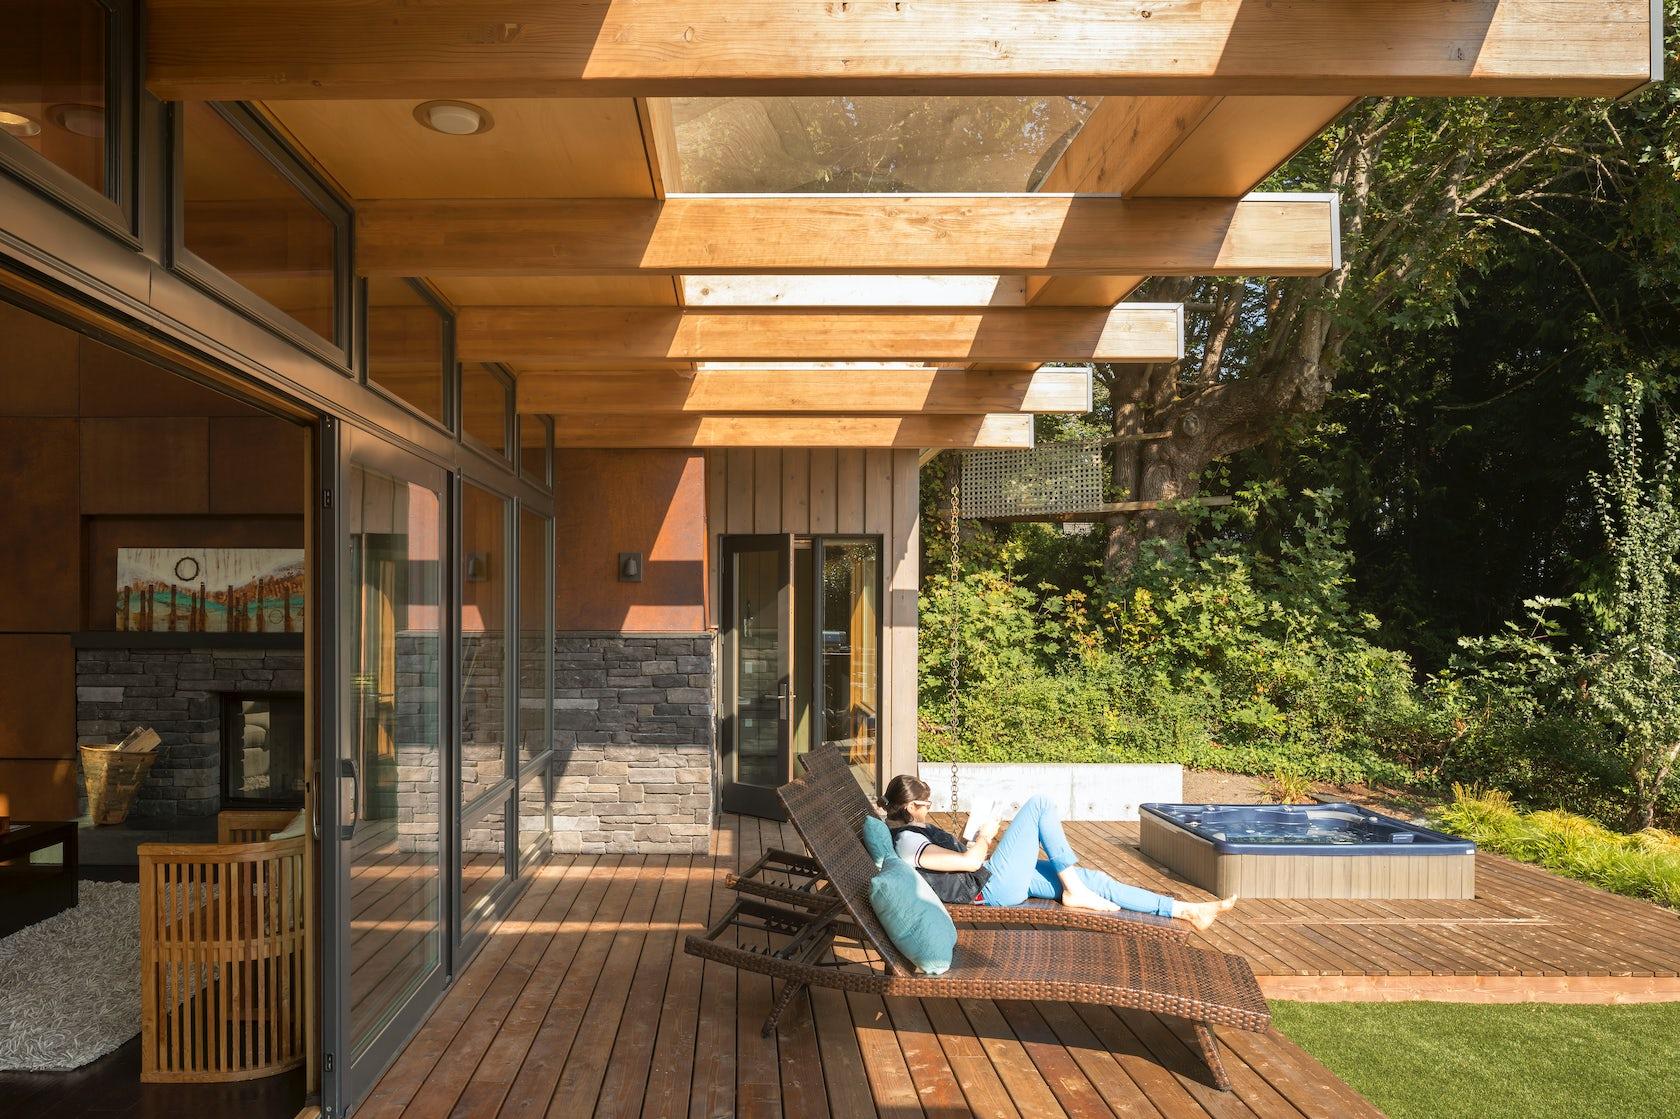 © Coates Design: Architecture & Interiors | Seattle Architects